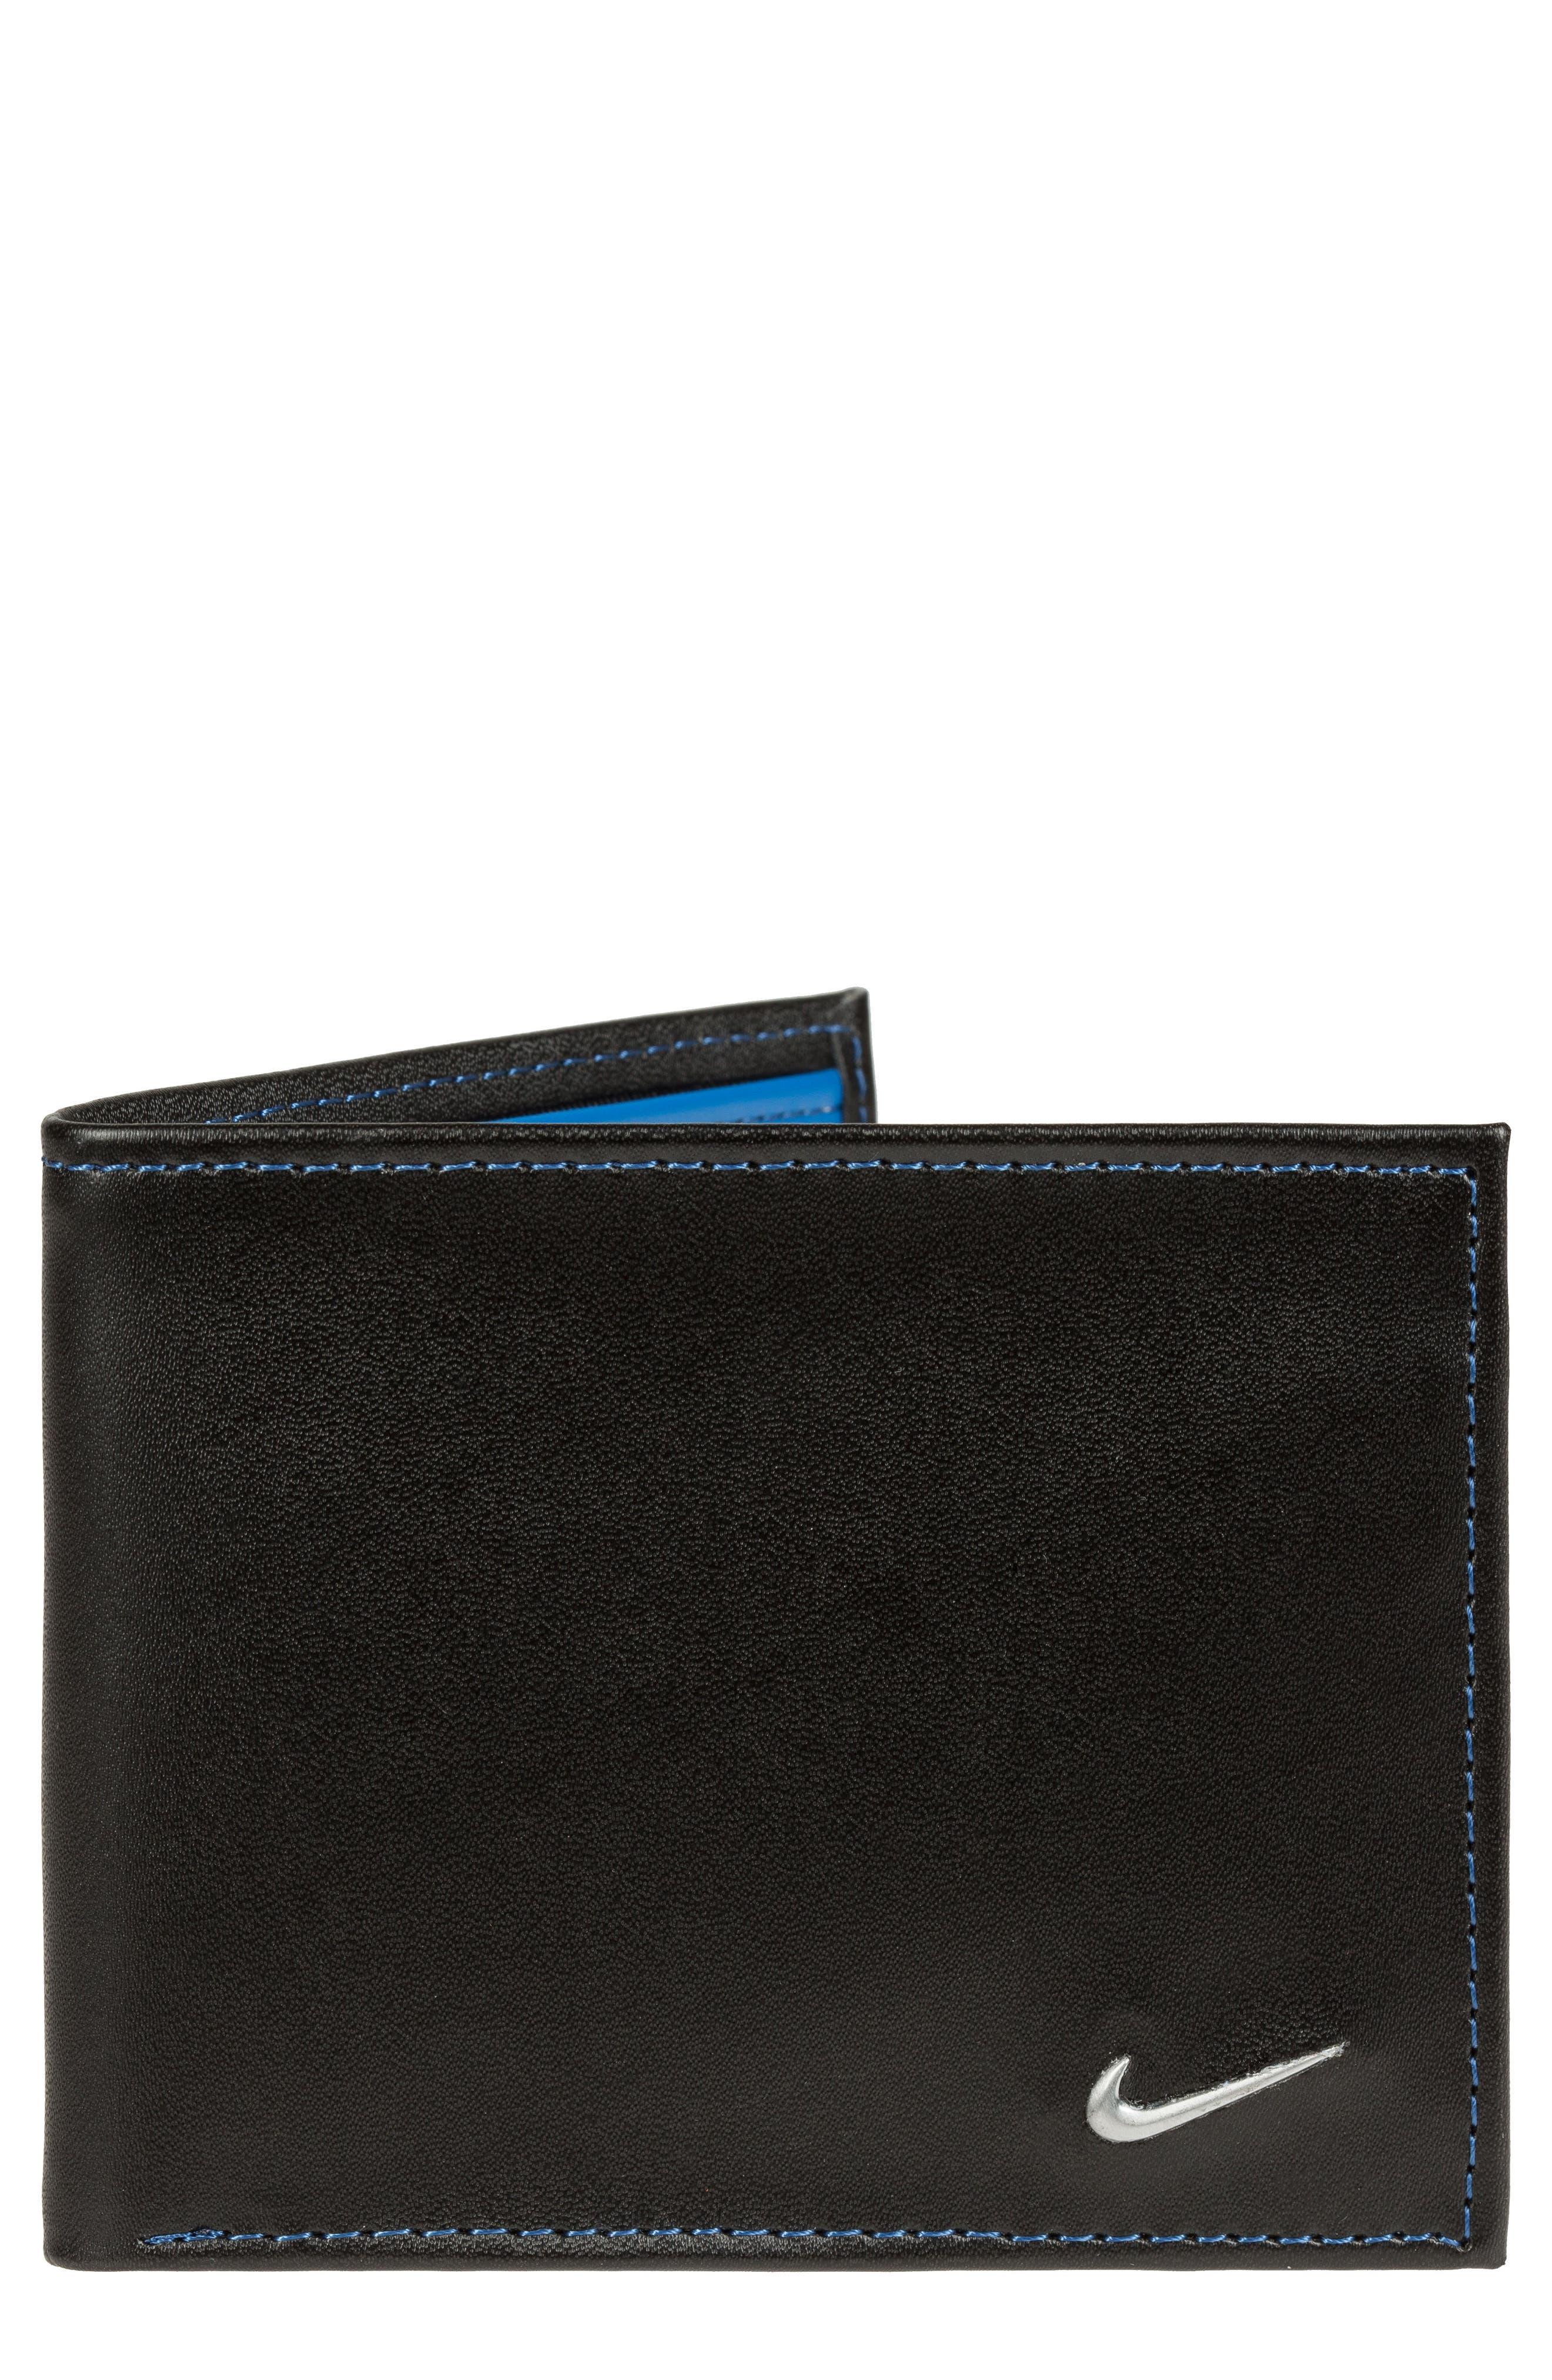 Main Image - Nike Modern Leather Wallet